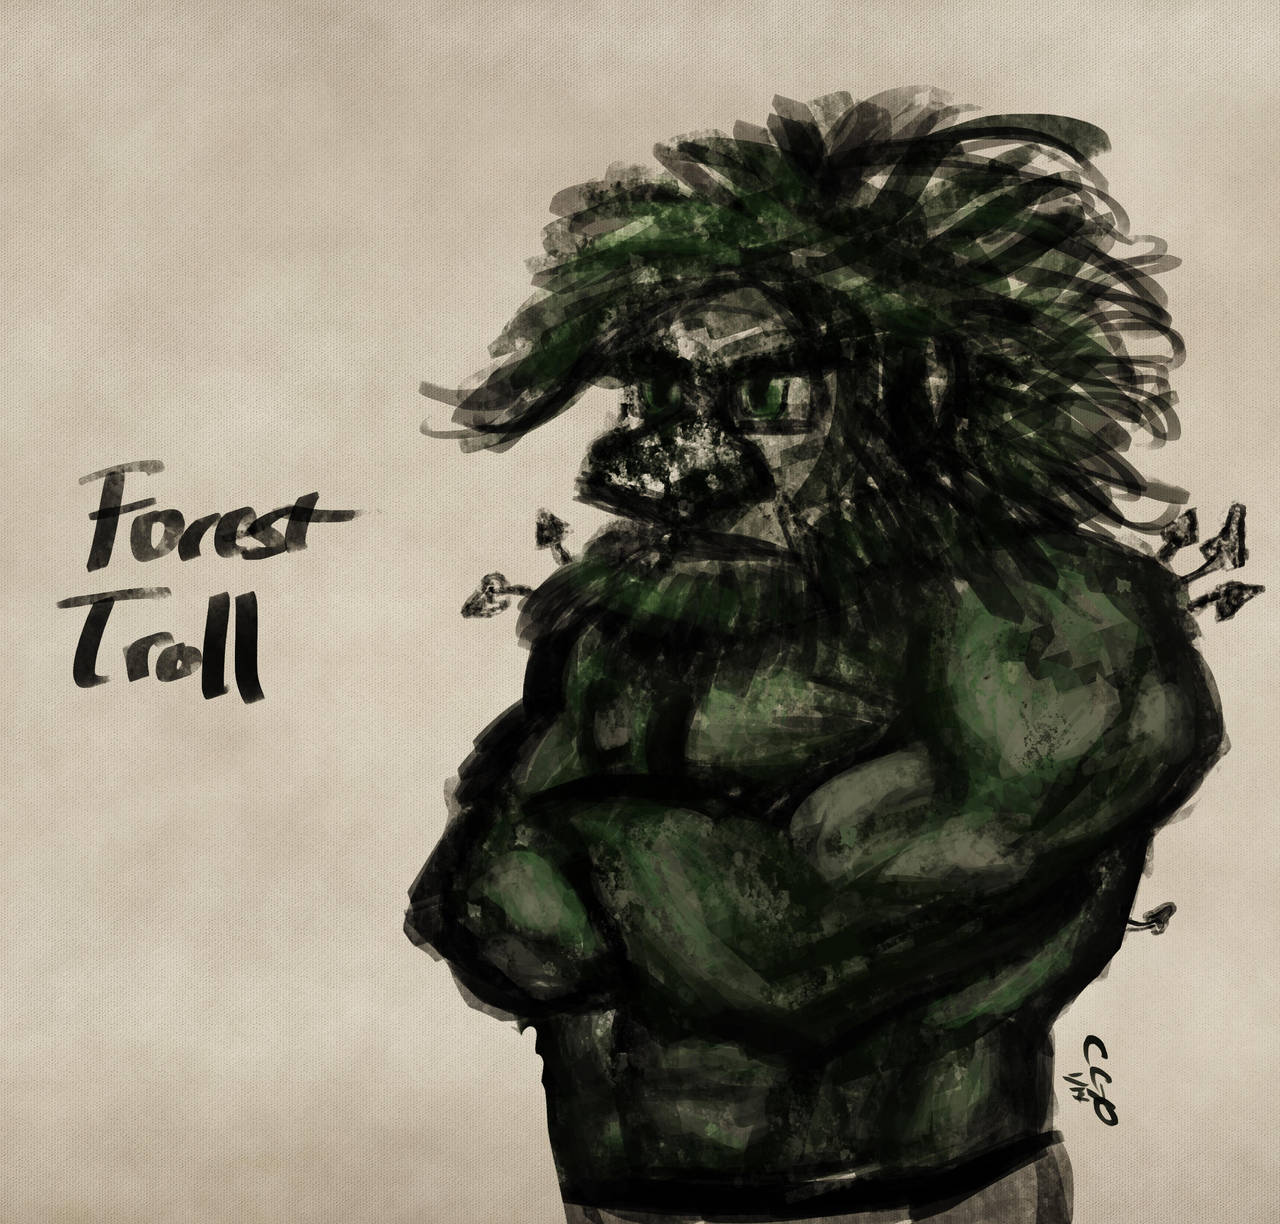 Forest Troll Sketch by Callego